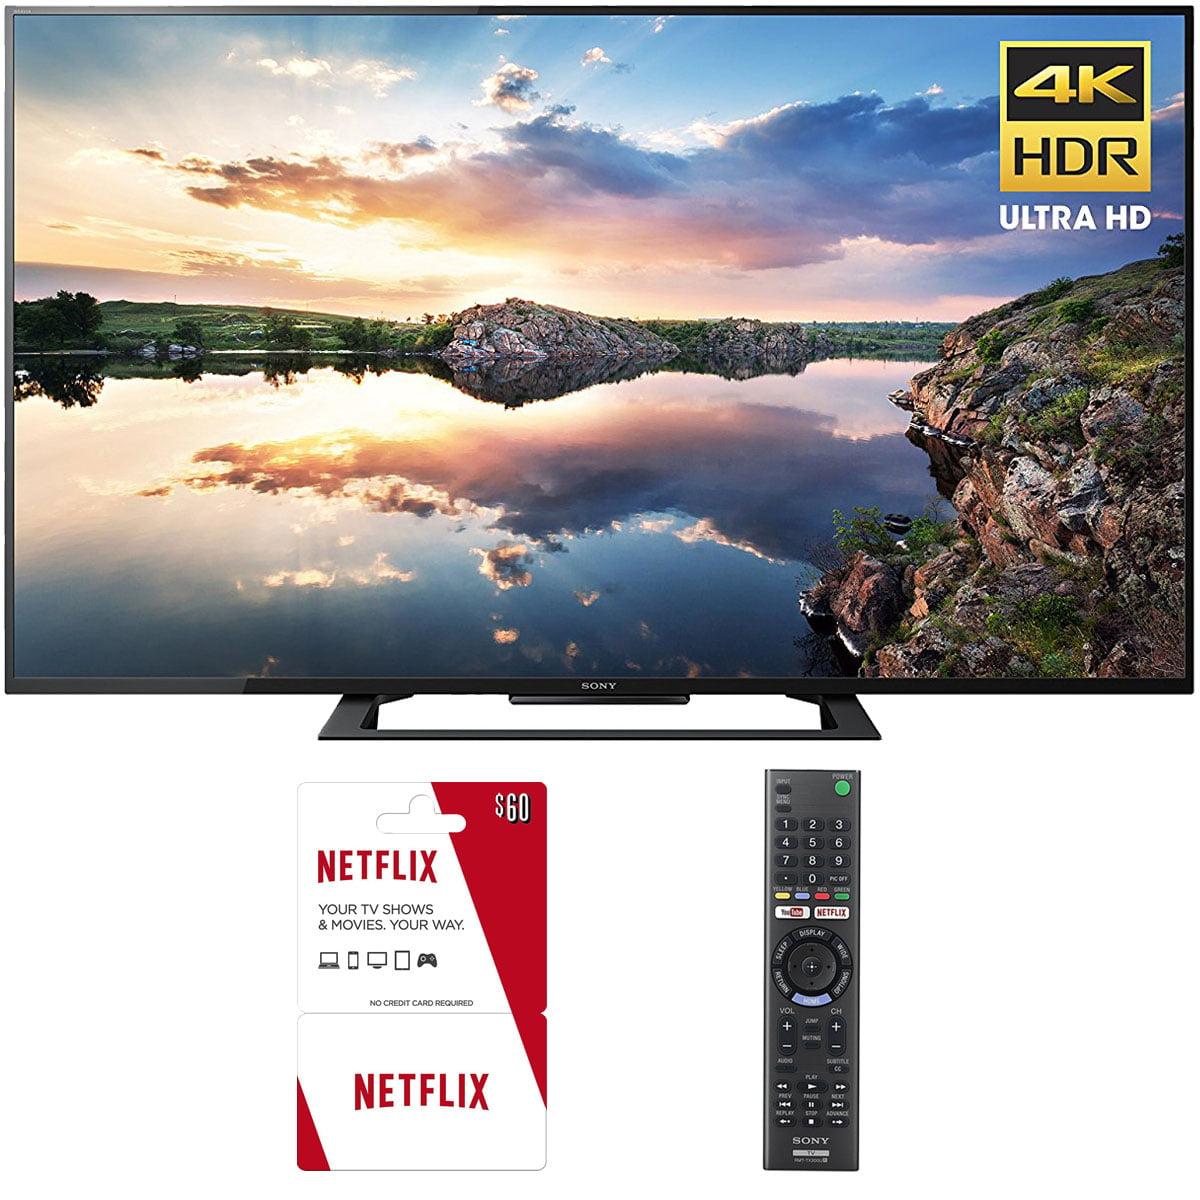 Sony KD70X690E 70-Inch 4K Ultra HD Smart LED TV (2017) Plus 6 Free Months of Netflix by Sony